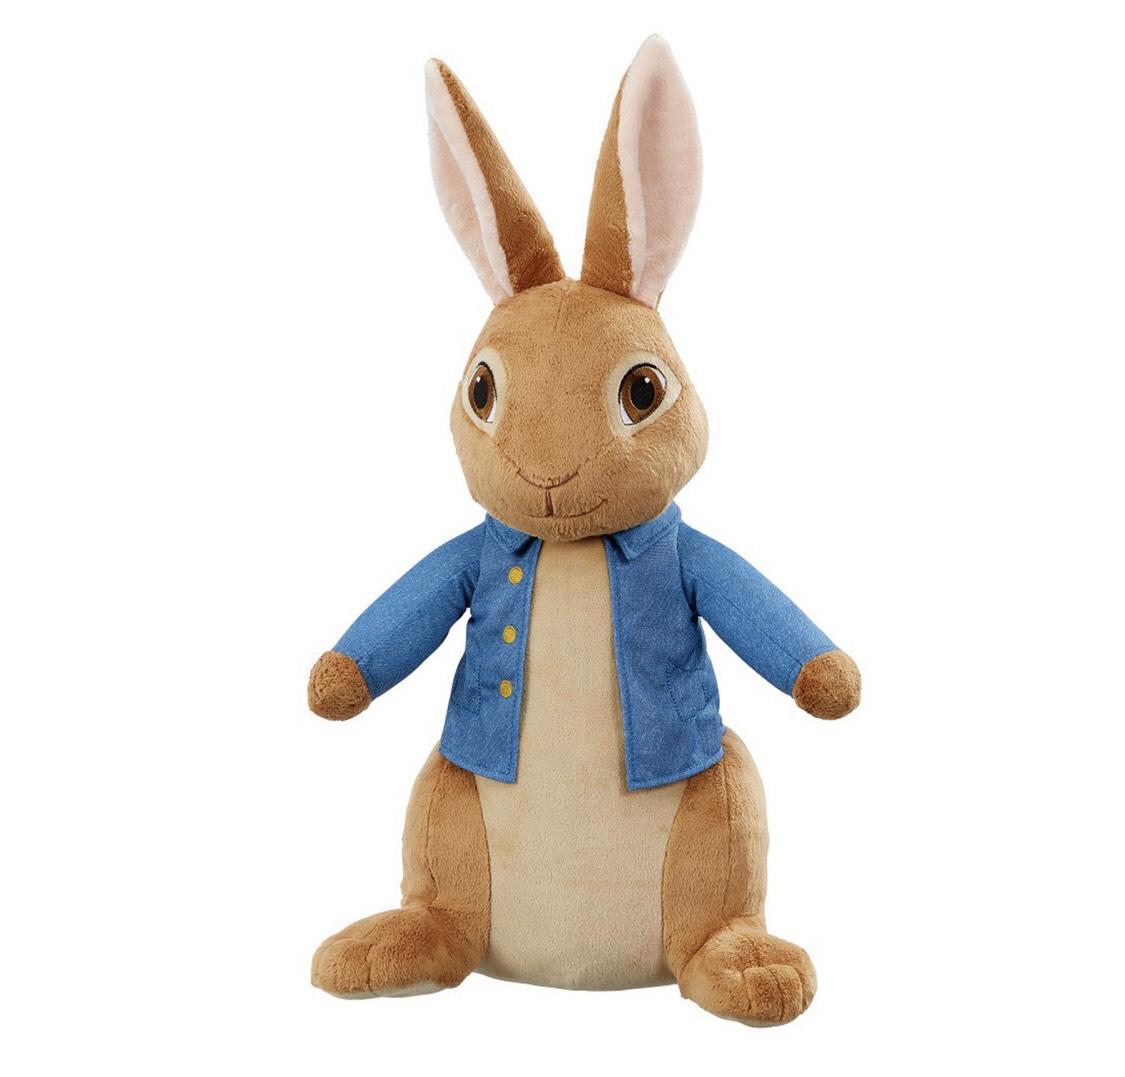 Peter Rabbit SuperSize Plush at Debenhams for £15